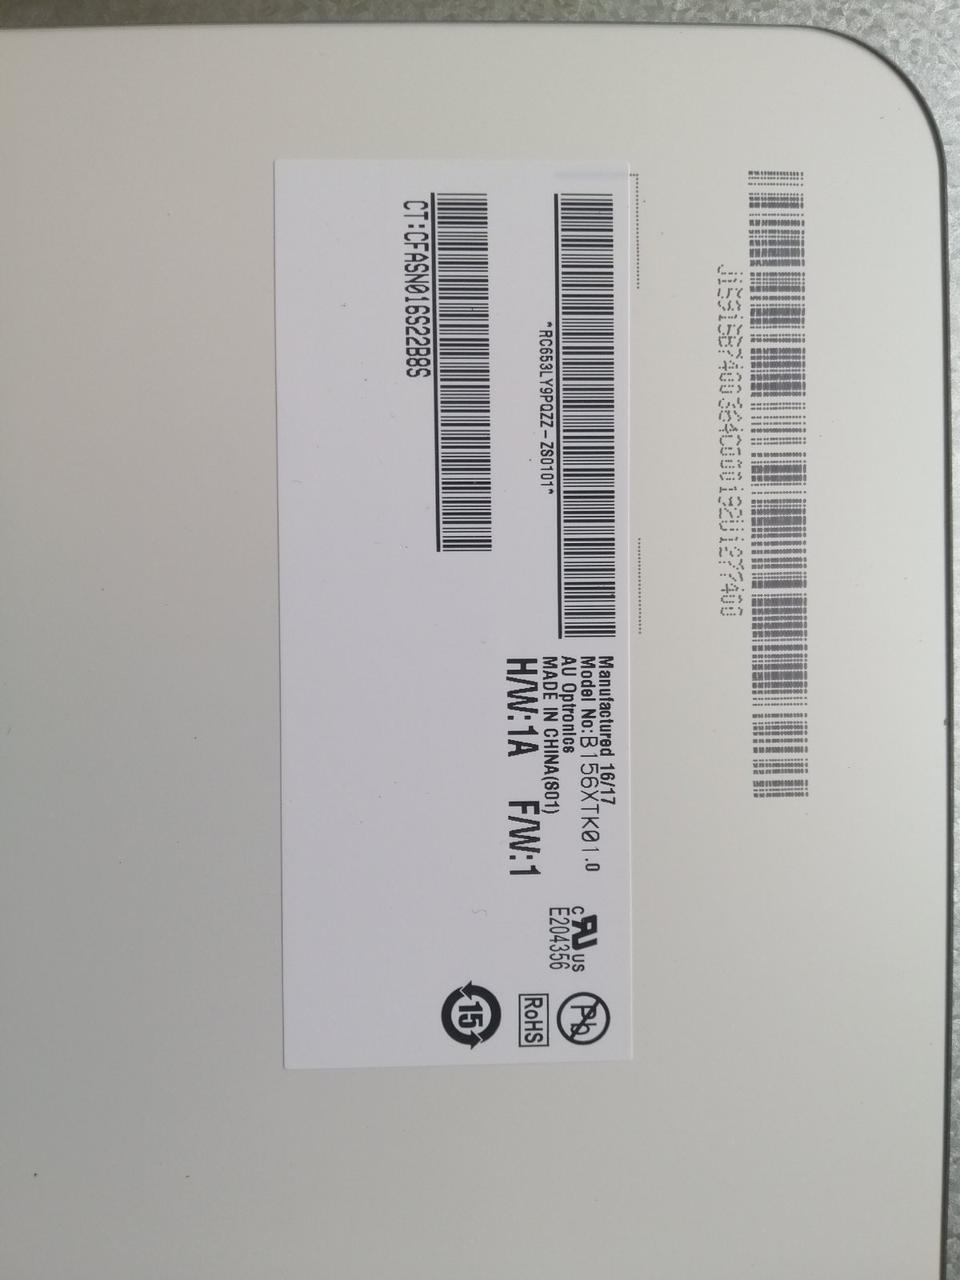 "Матрица 15.6"" AUO B156XTK01.0 1366*768, 40Pin  справа, LED Slim ушки сверху-снизу Глянцевая"